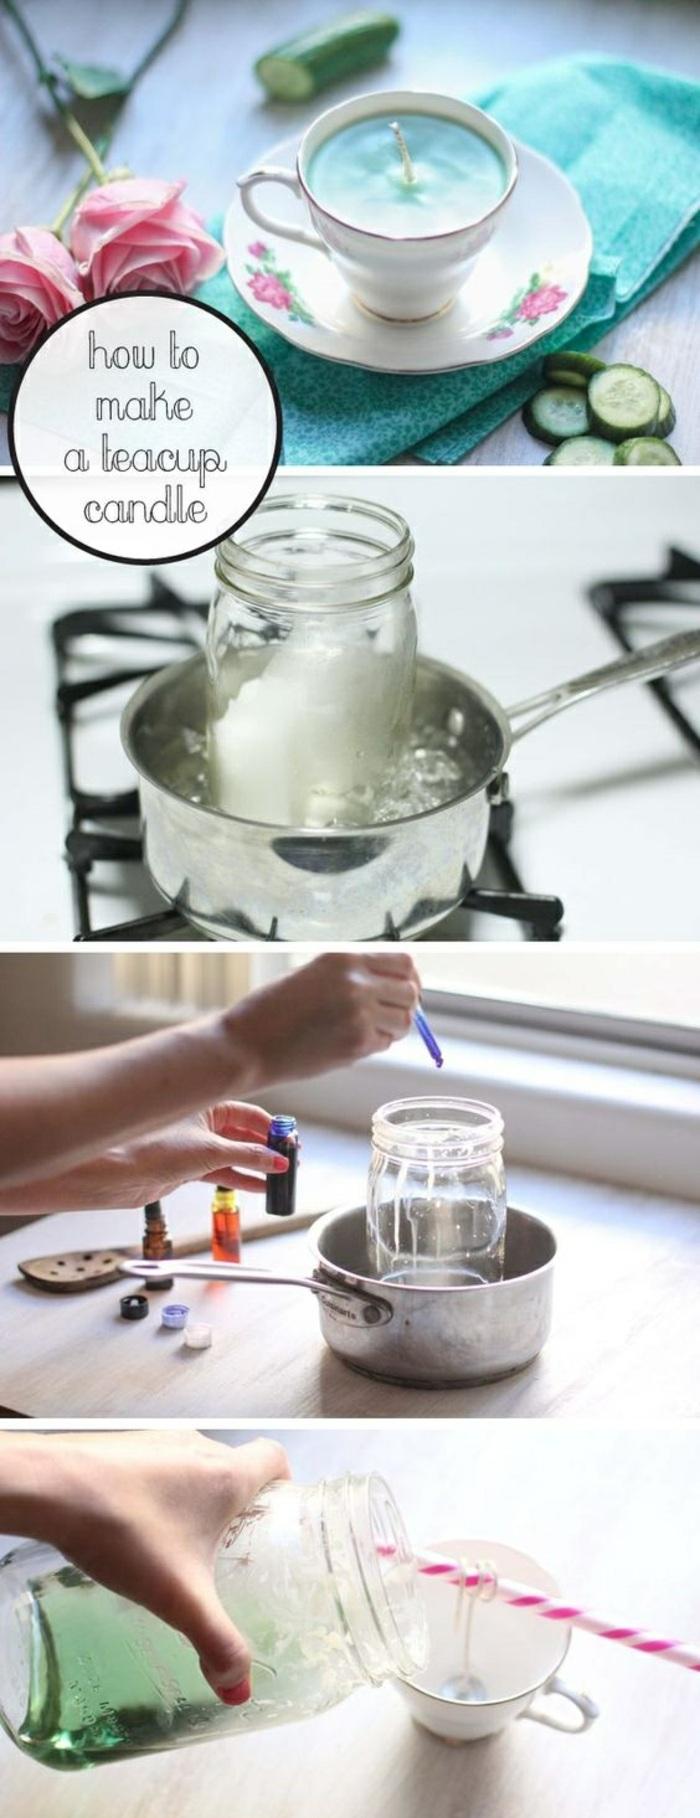 tutoriales sobre como elaborar velas aromaticas en casa con fotos paso a paso, tazas con velas